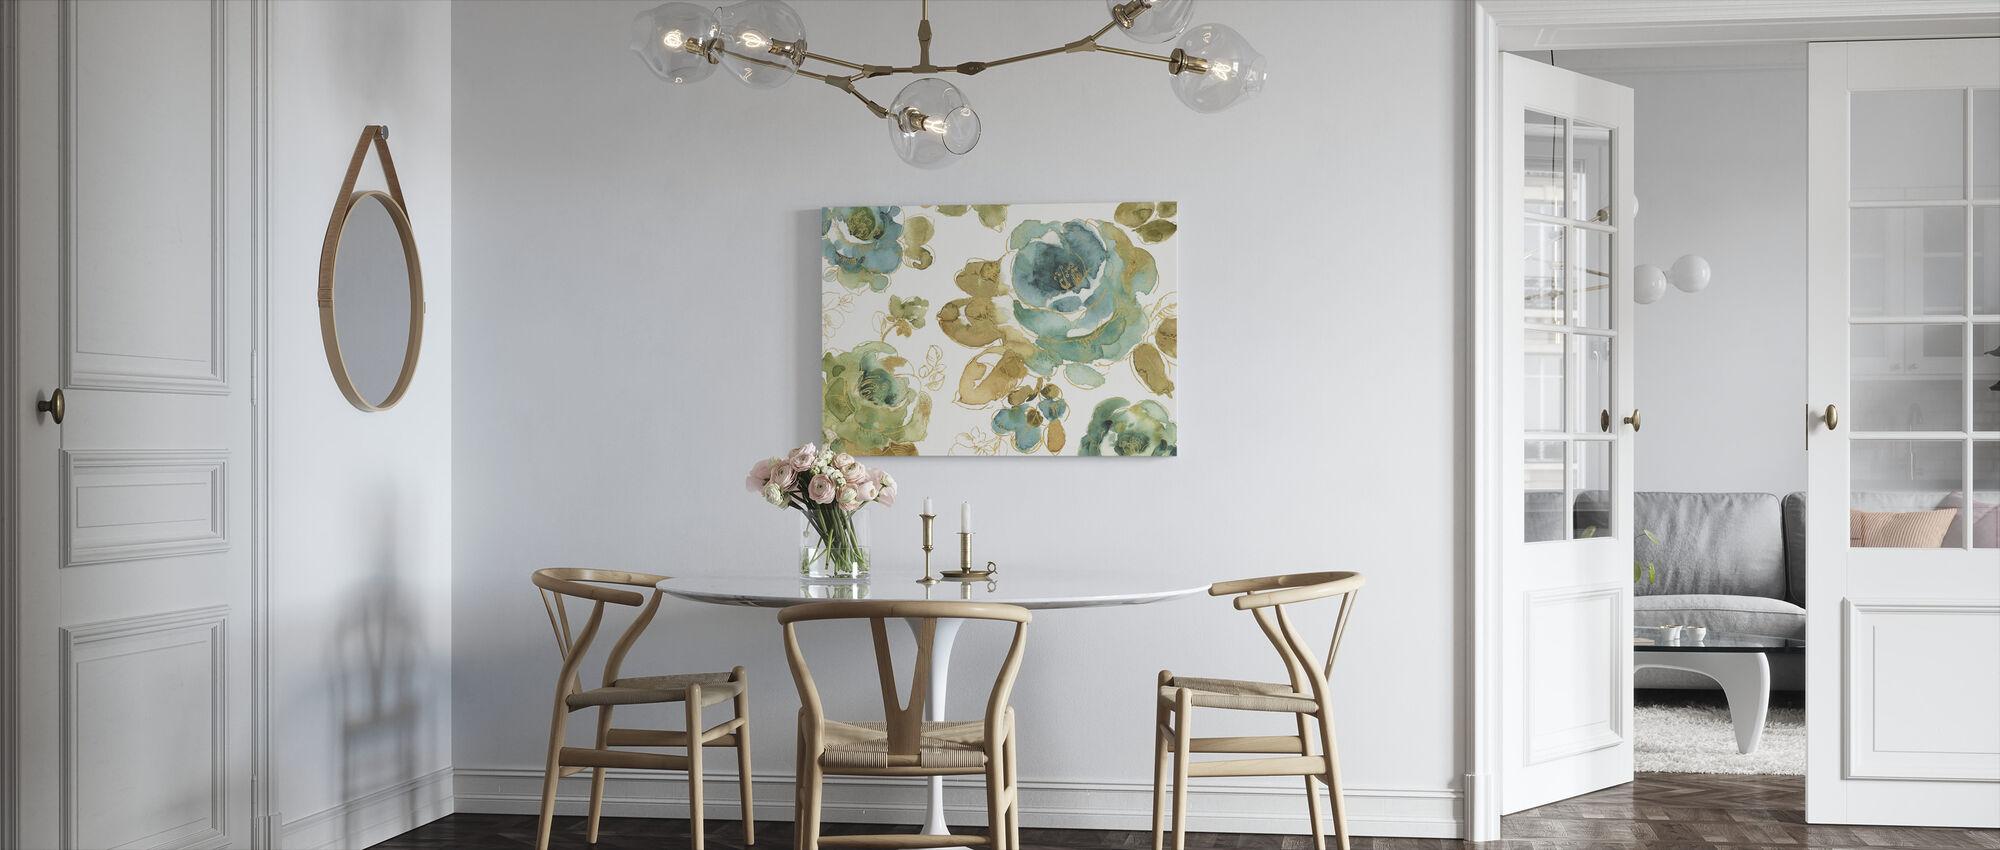 Mijn broeikas Rozen - Canvas print - Keuken